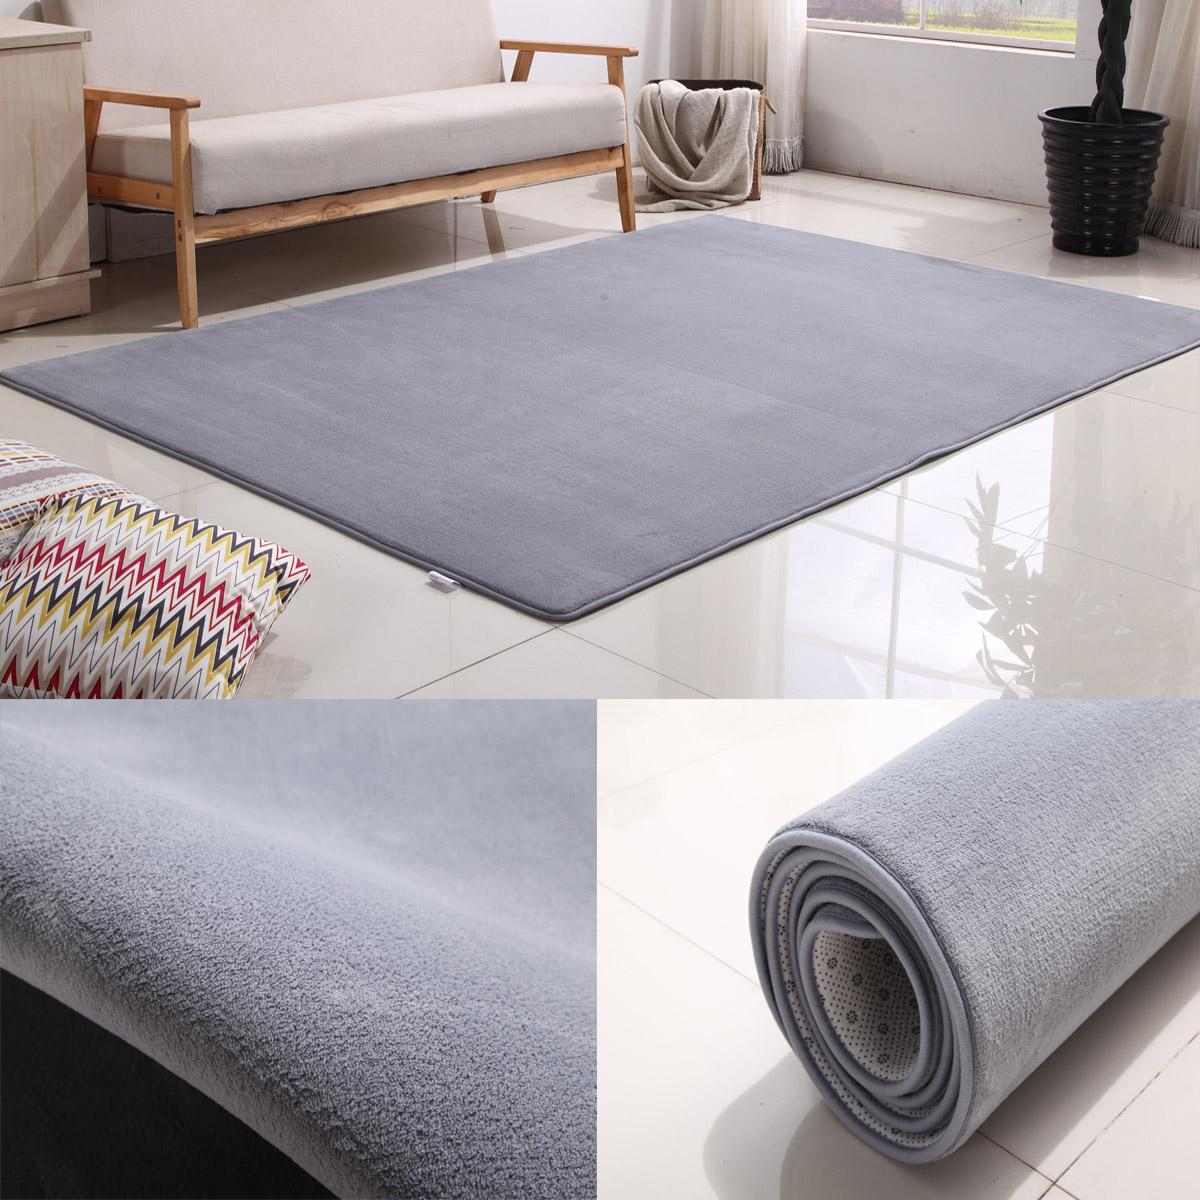 The wedding bed baby bedroom photo red carpet mat tatami grey blanket Nordic Green Wedding